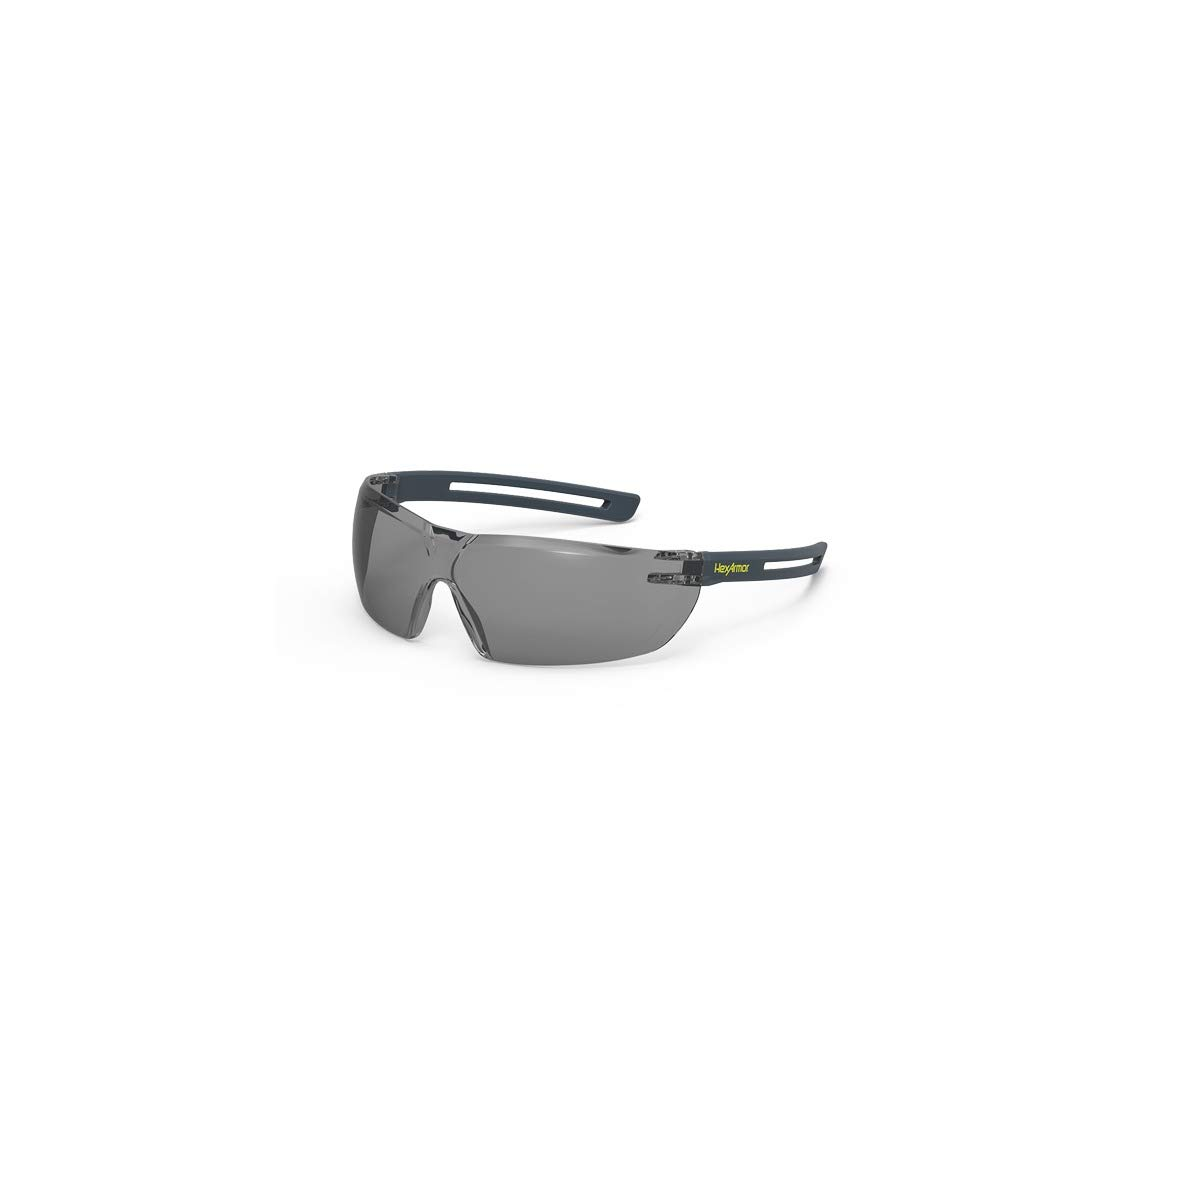 HexArmor LT400 z87 Lightweight Grey Tint Anti Fog Safety Glasses